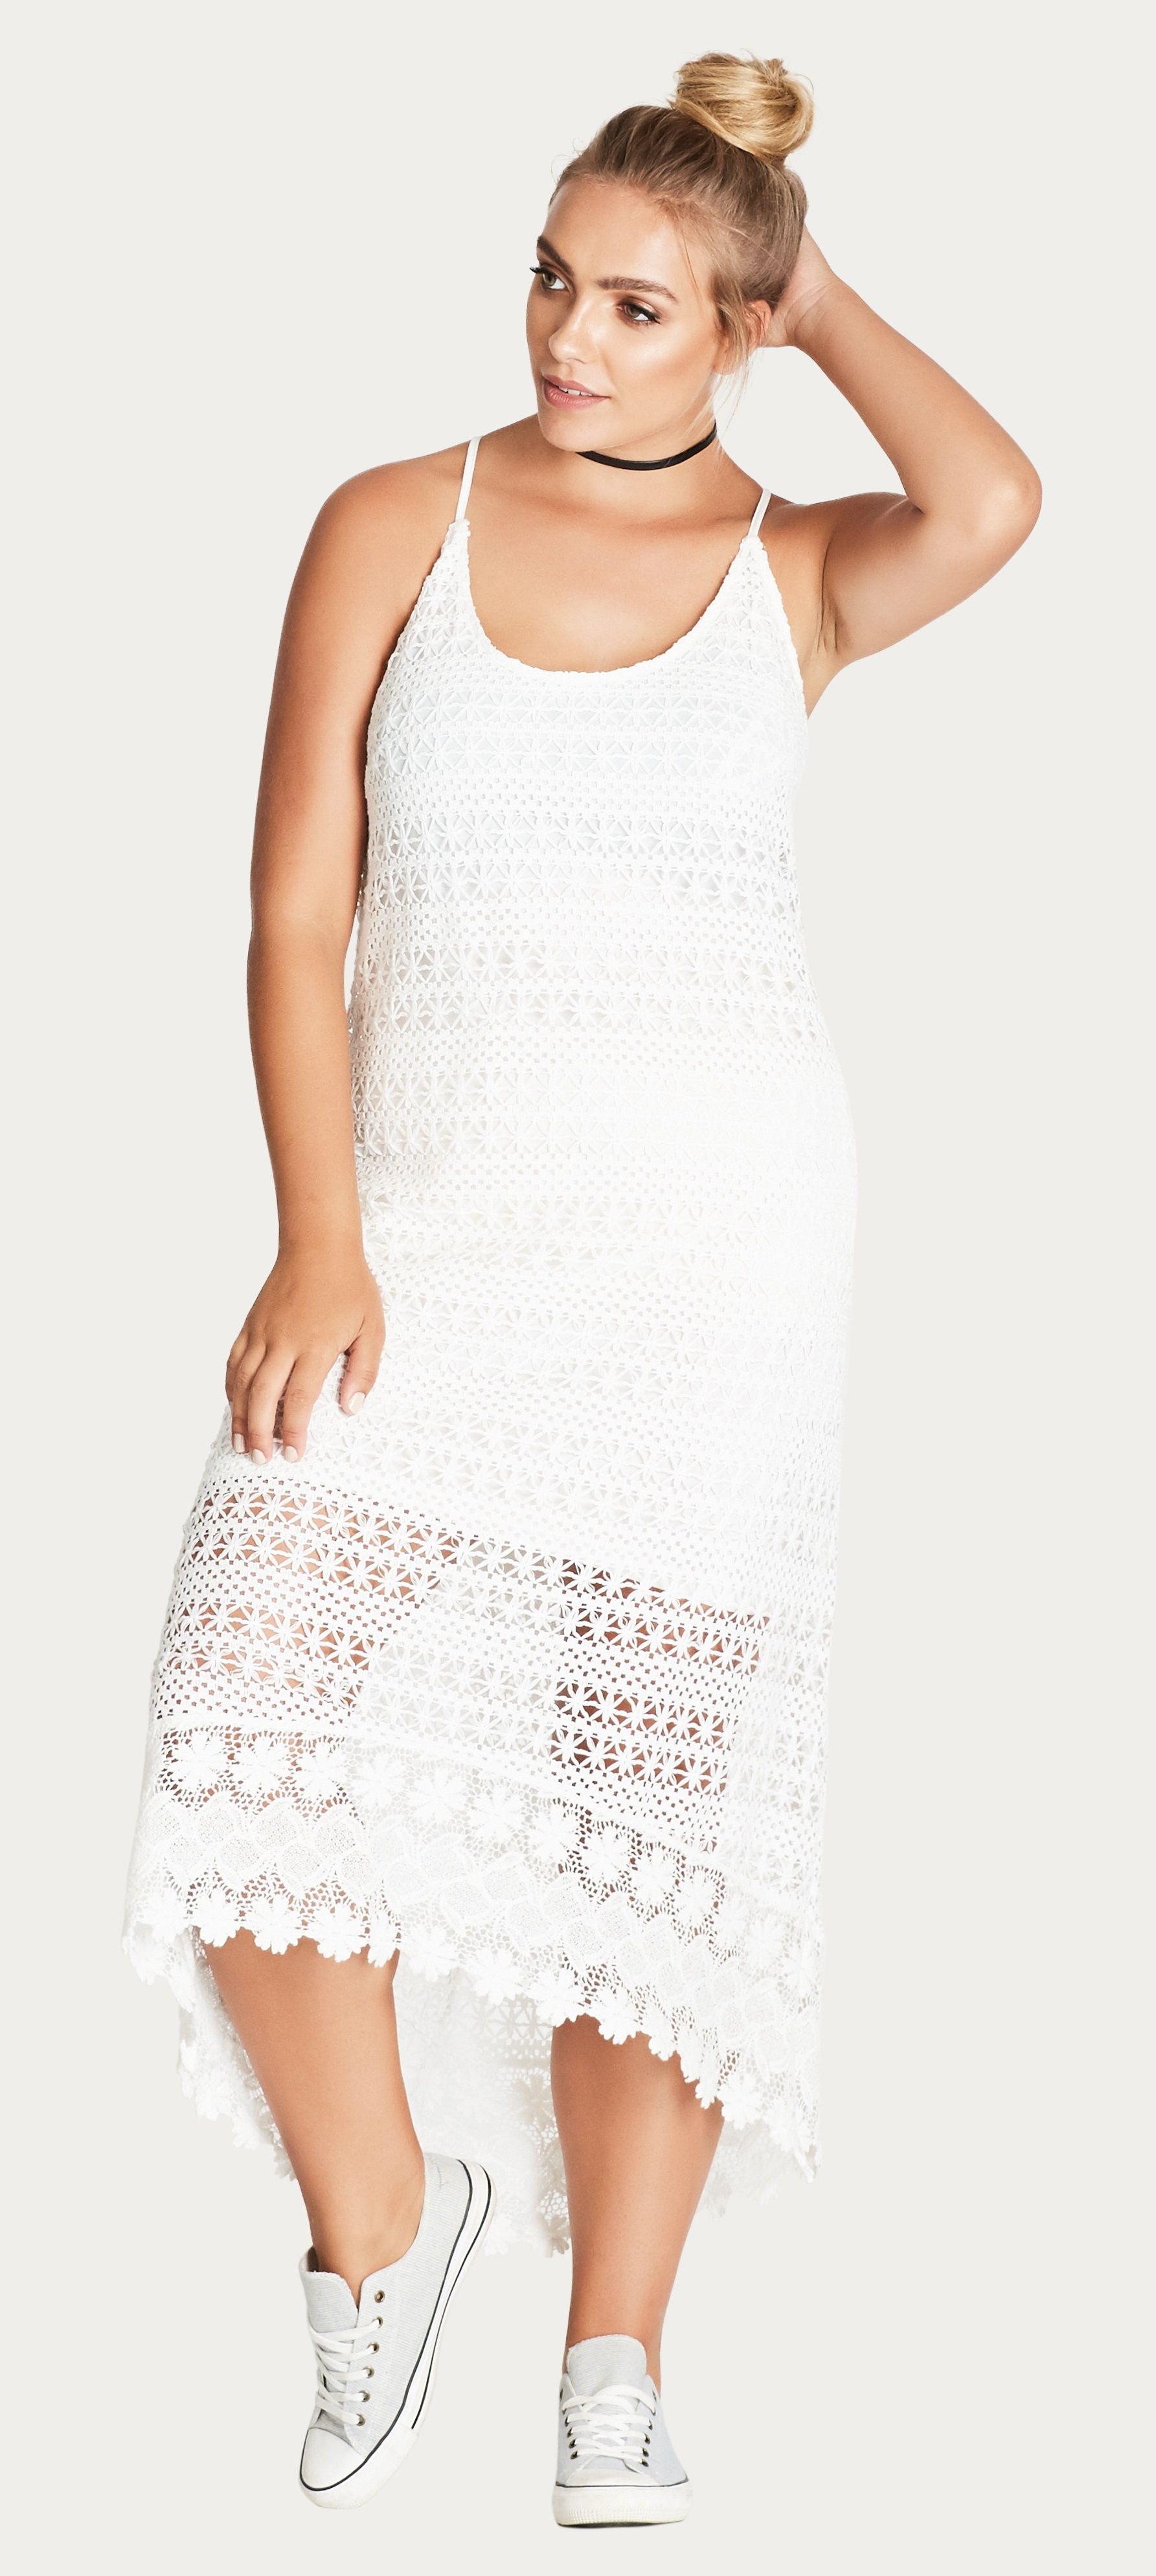 Plus Size Crochet Dress Plus Size Fashion Pinterest Crochet